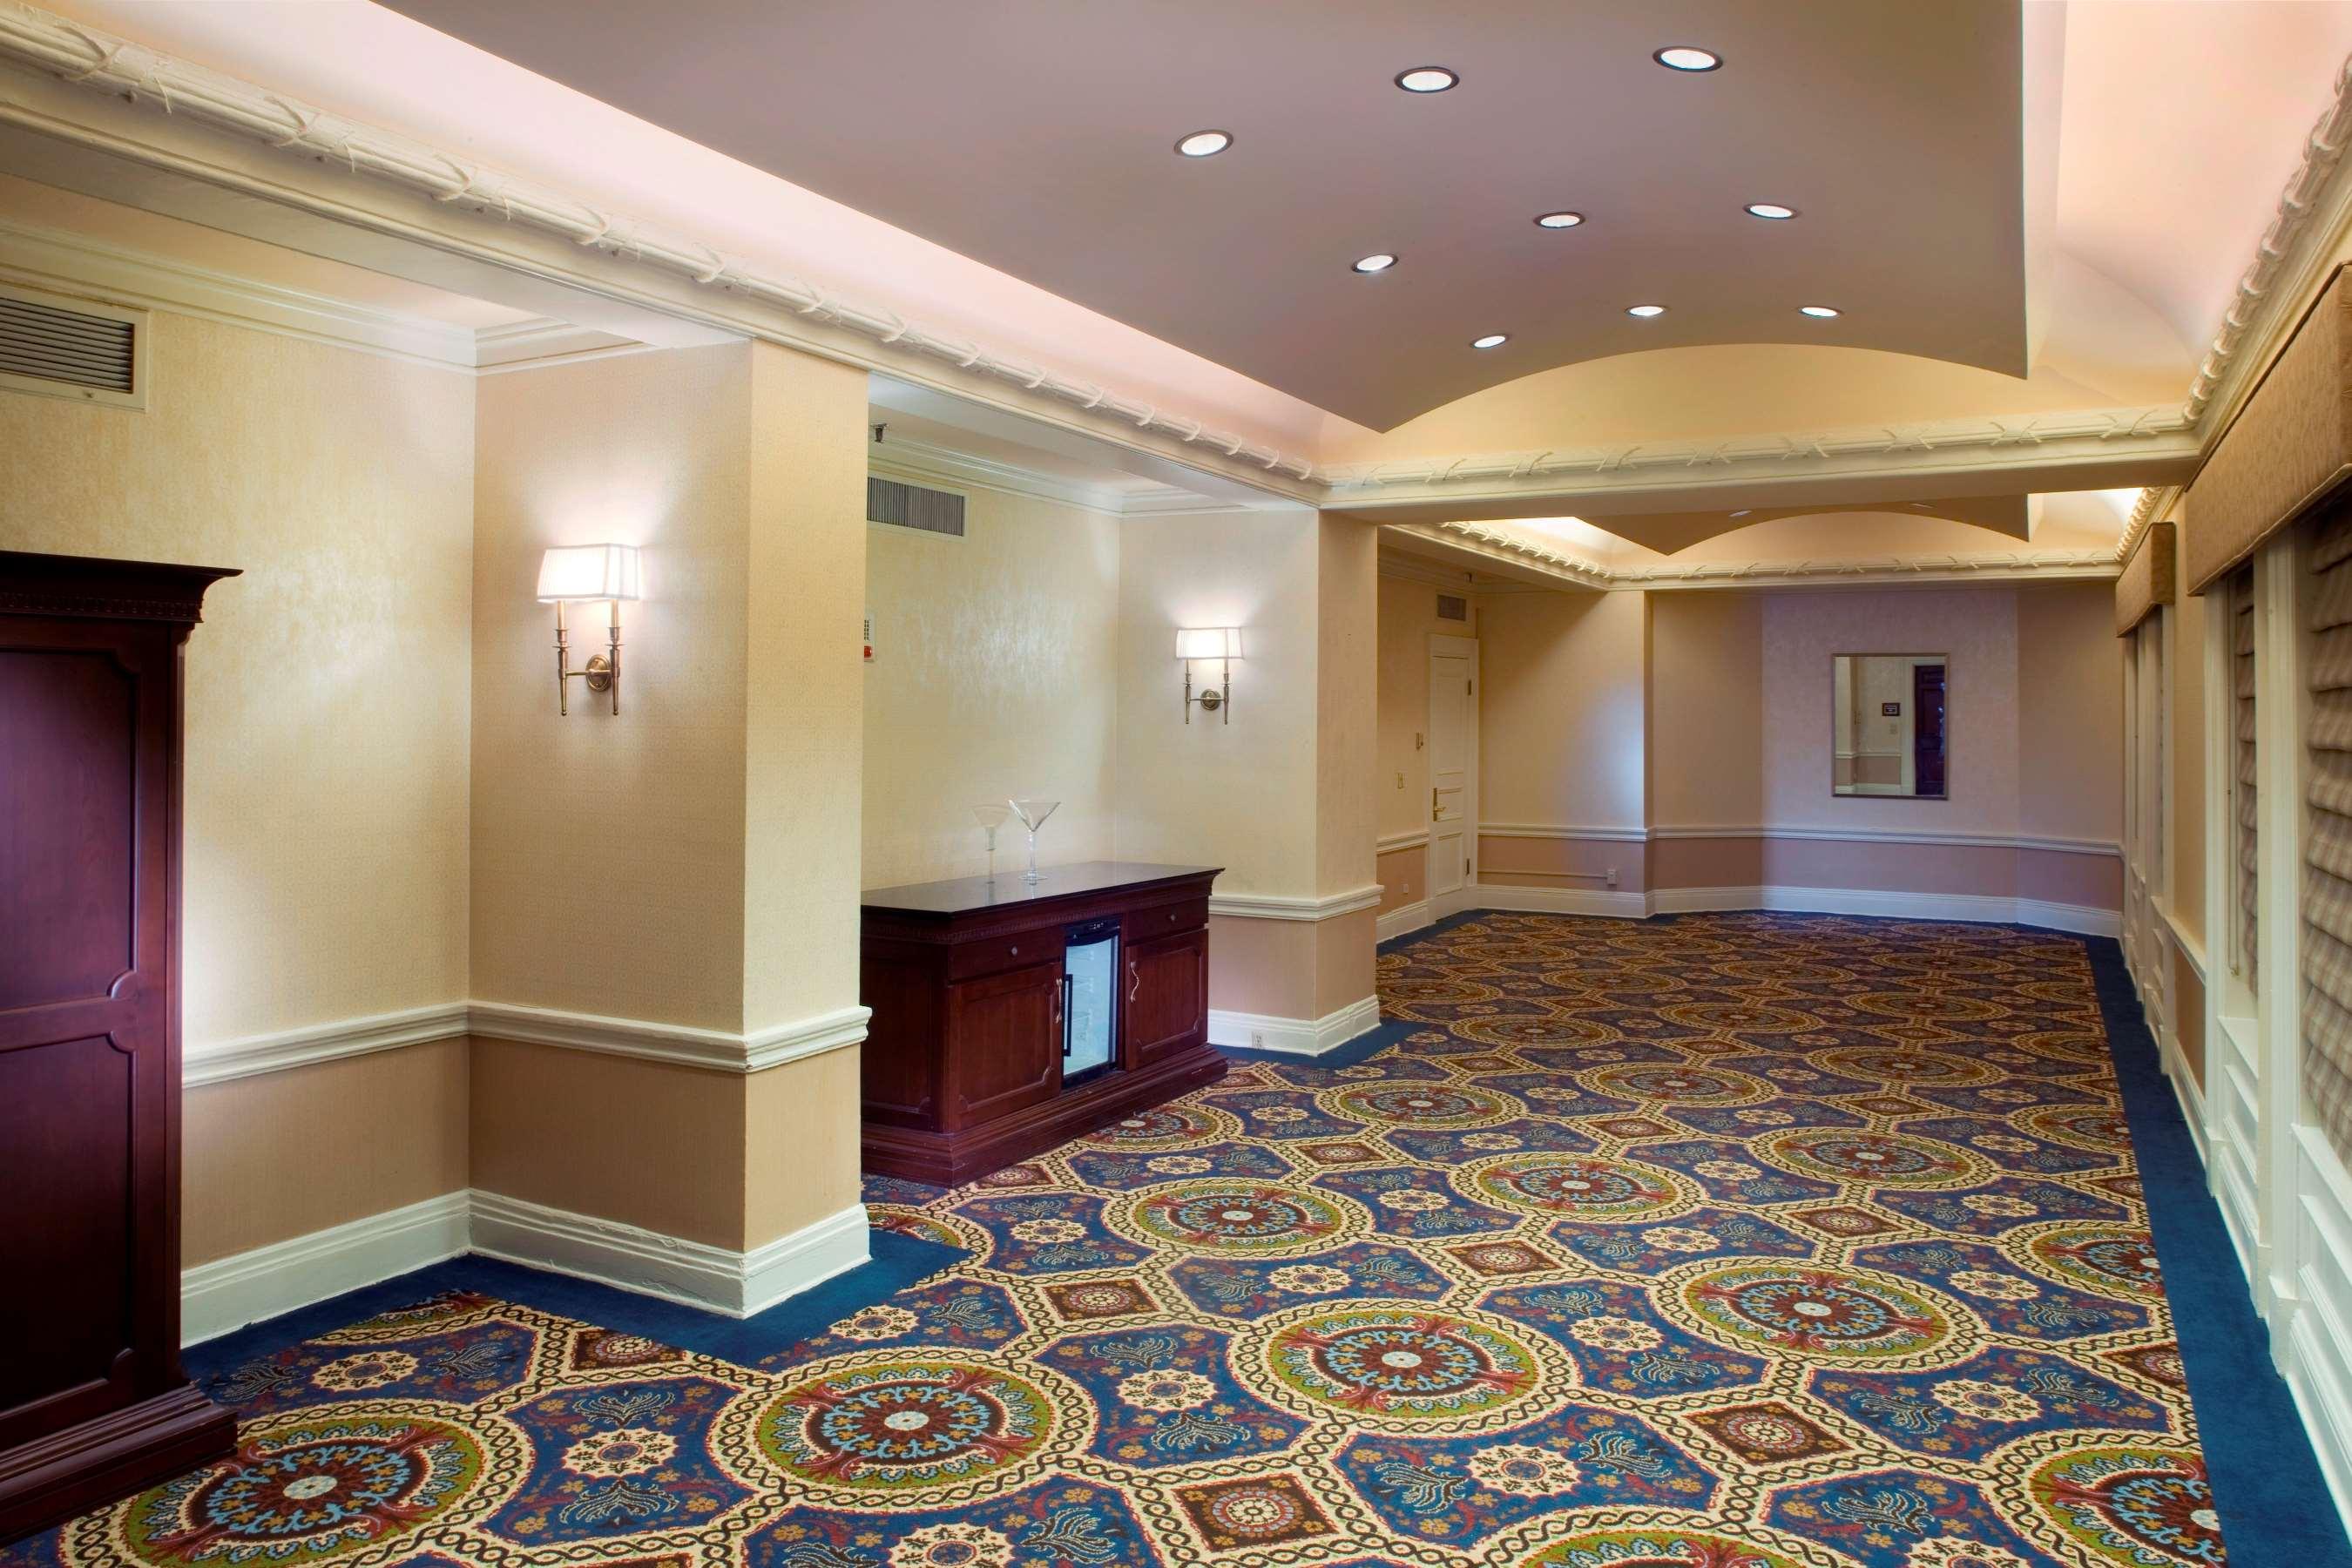 The Seelbach Hilton Louisville image 16